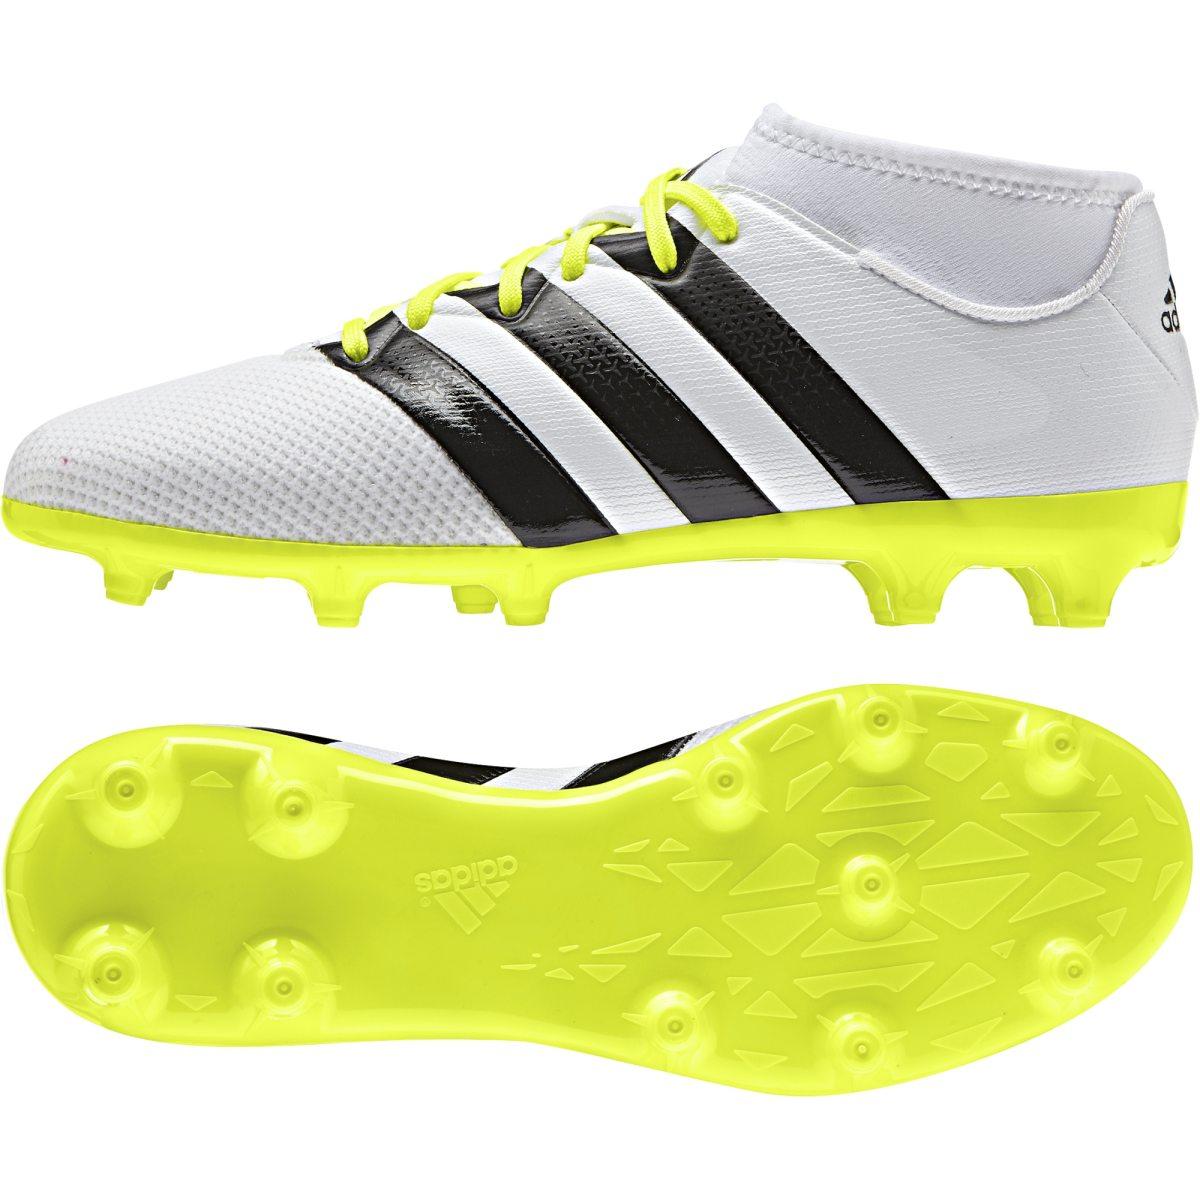 finest selection bde67 8f245 adidas ace 16.3 primemesh fg ag fotbollssko dam fotbollsskor